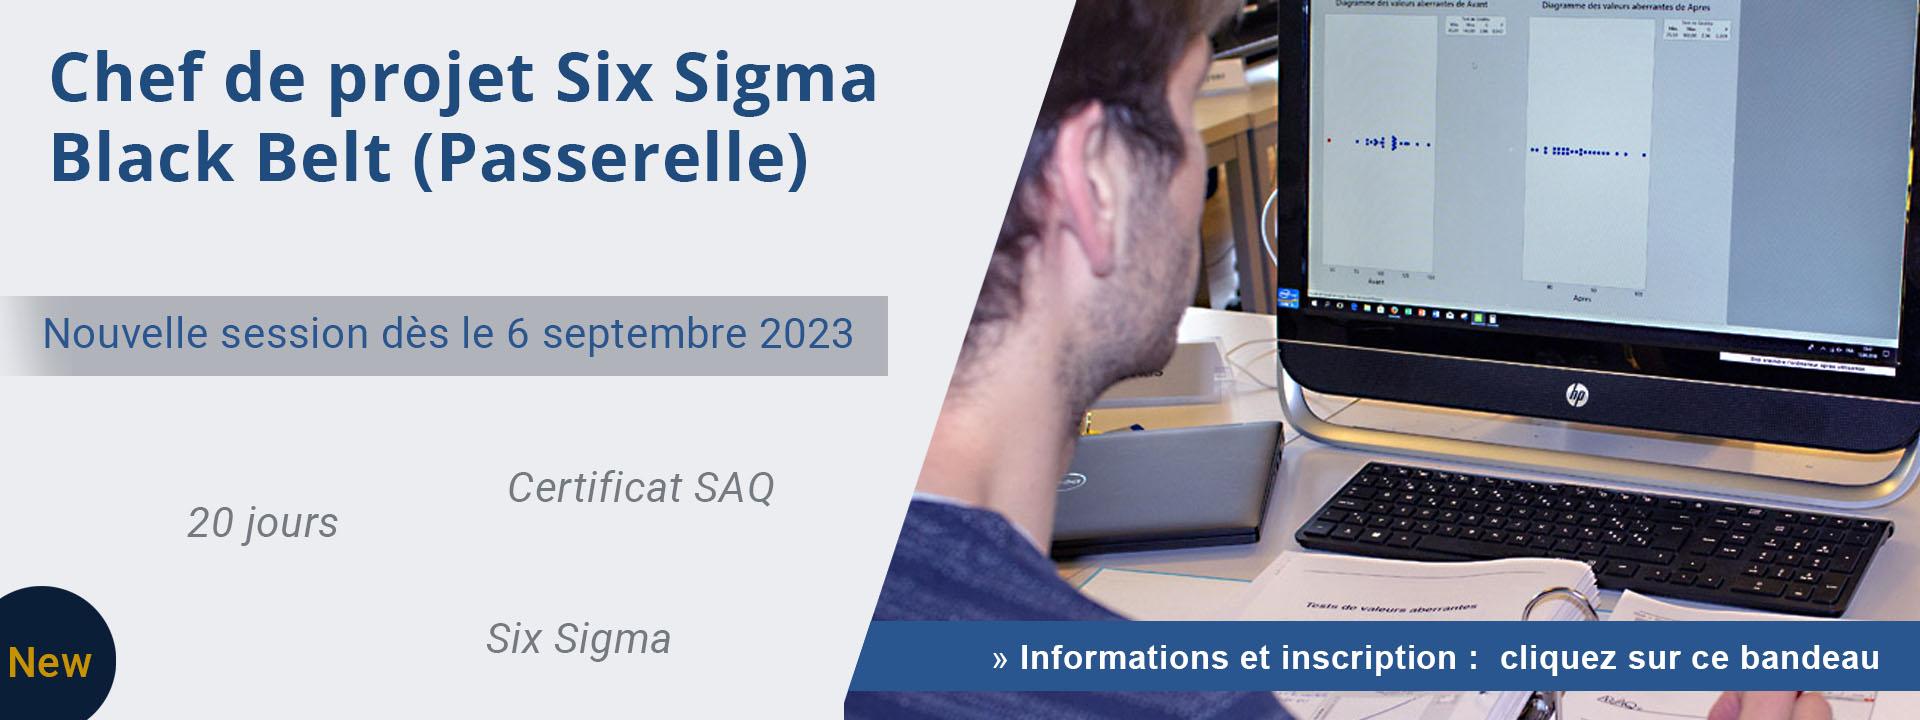 Chef de projet Six Sigma – Black Belt